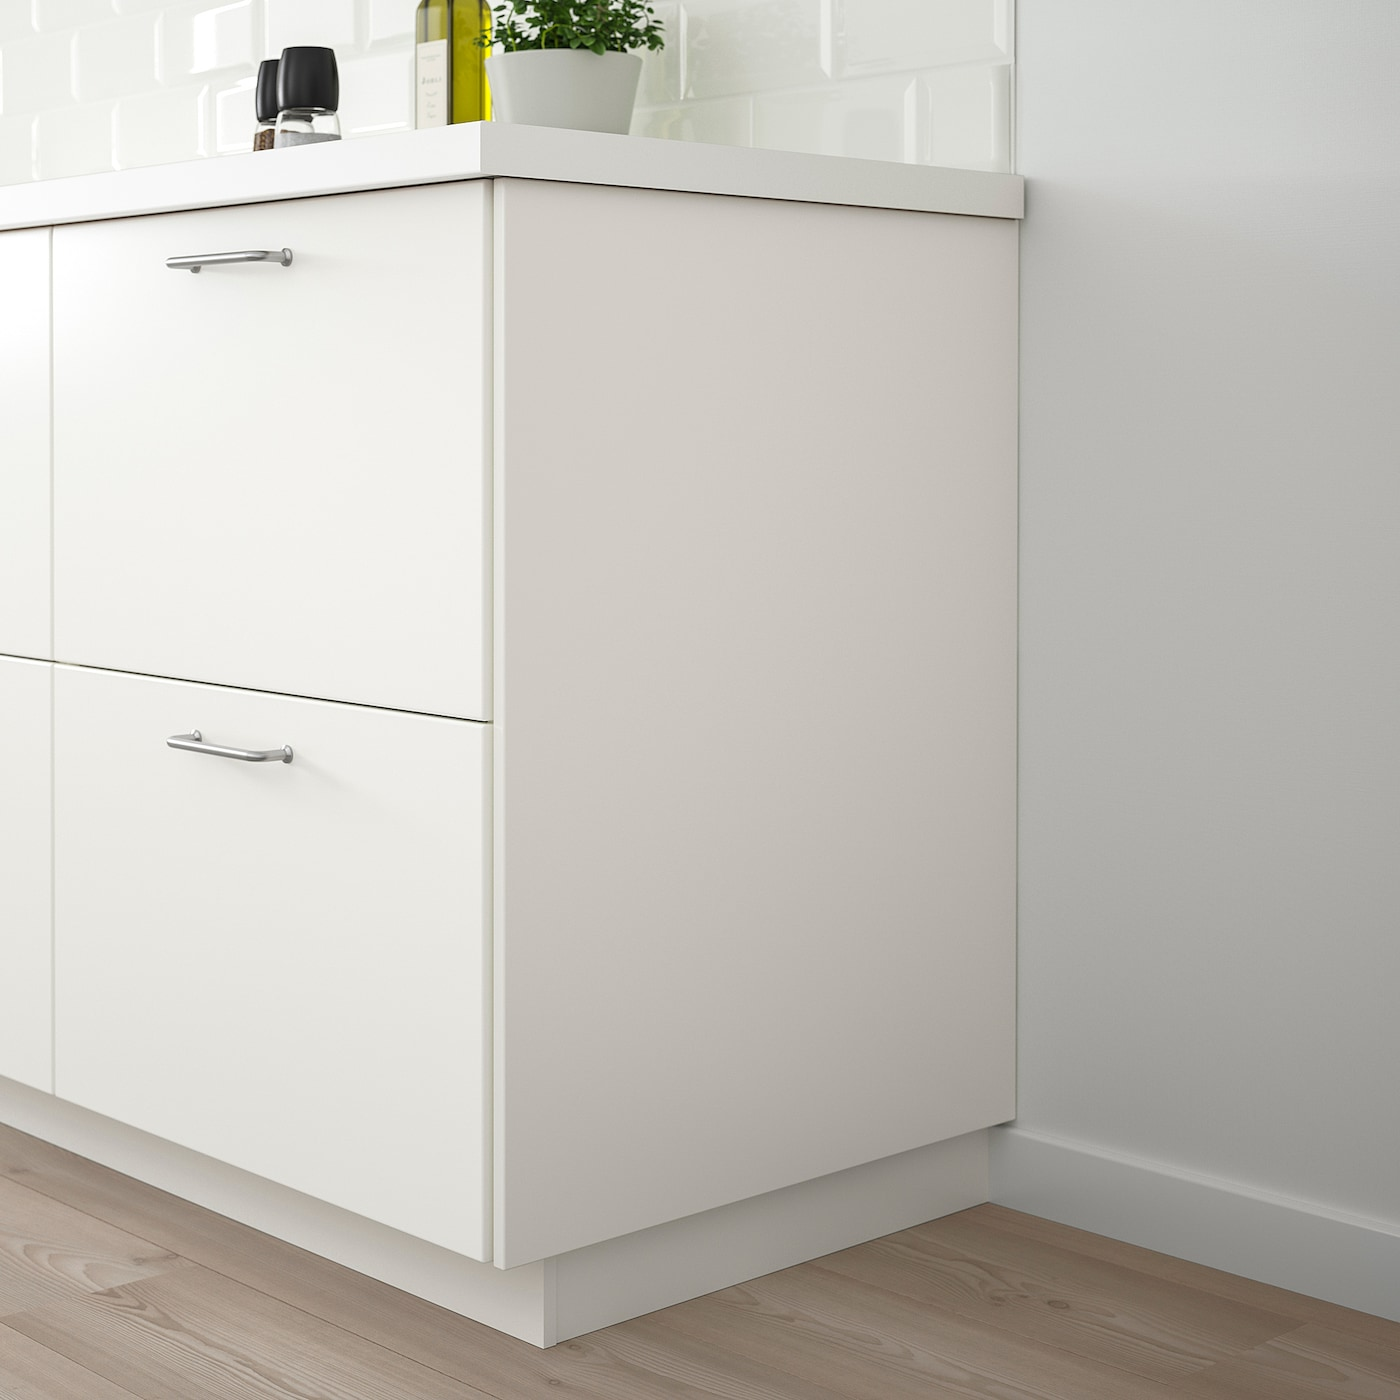 FÖRBÄTTRA Täcksida, vit, 62x80 cm IKEA